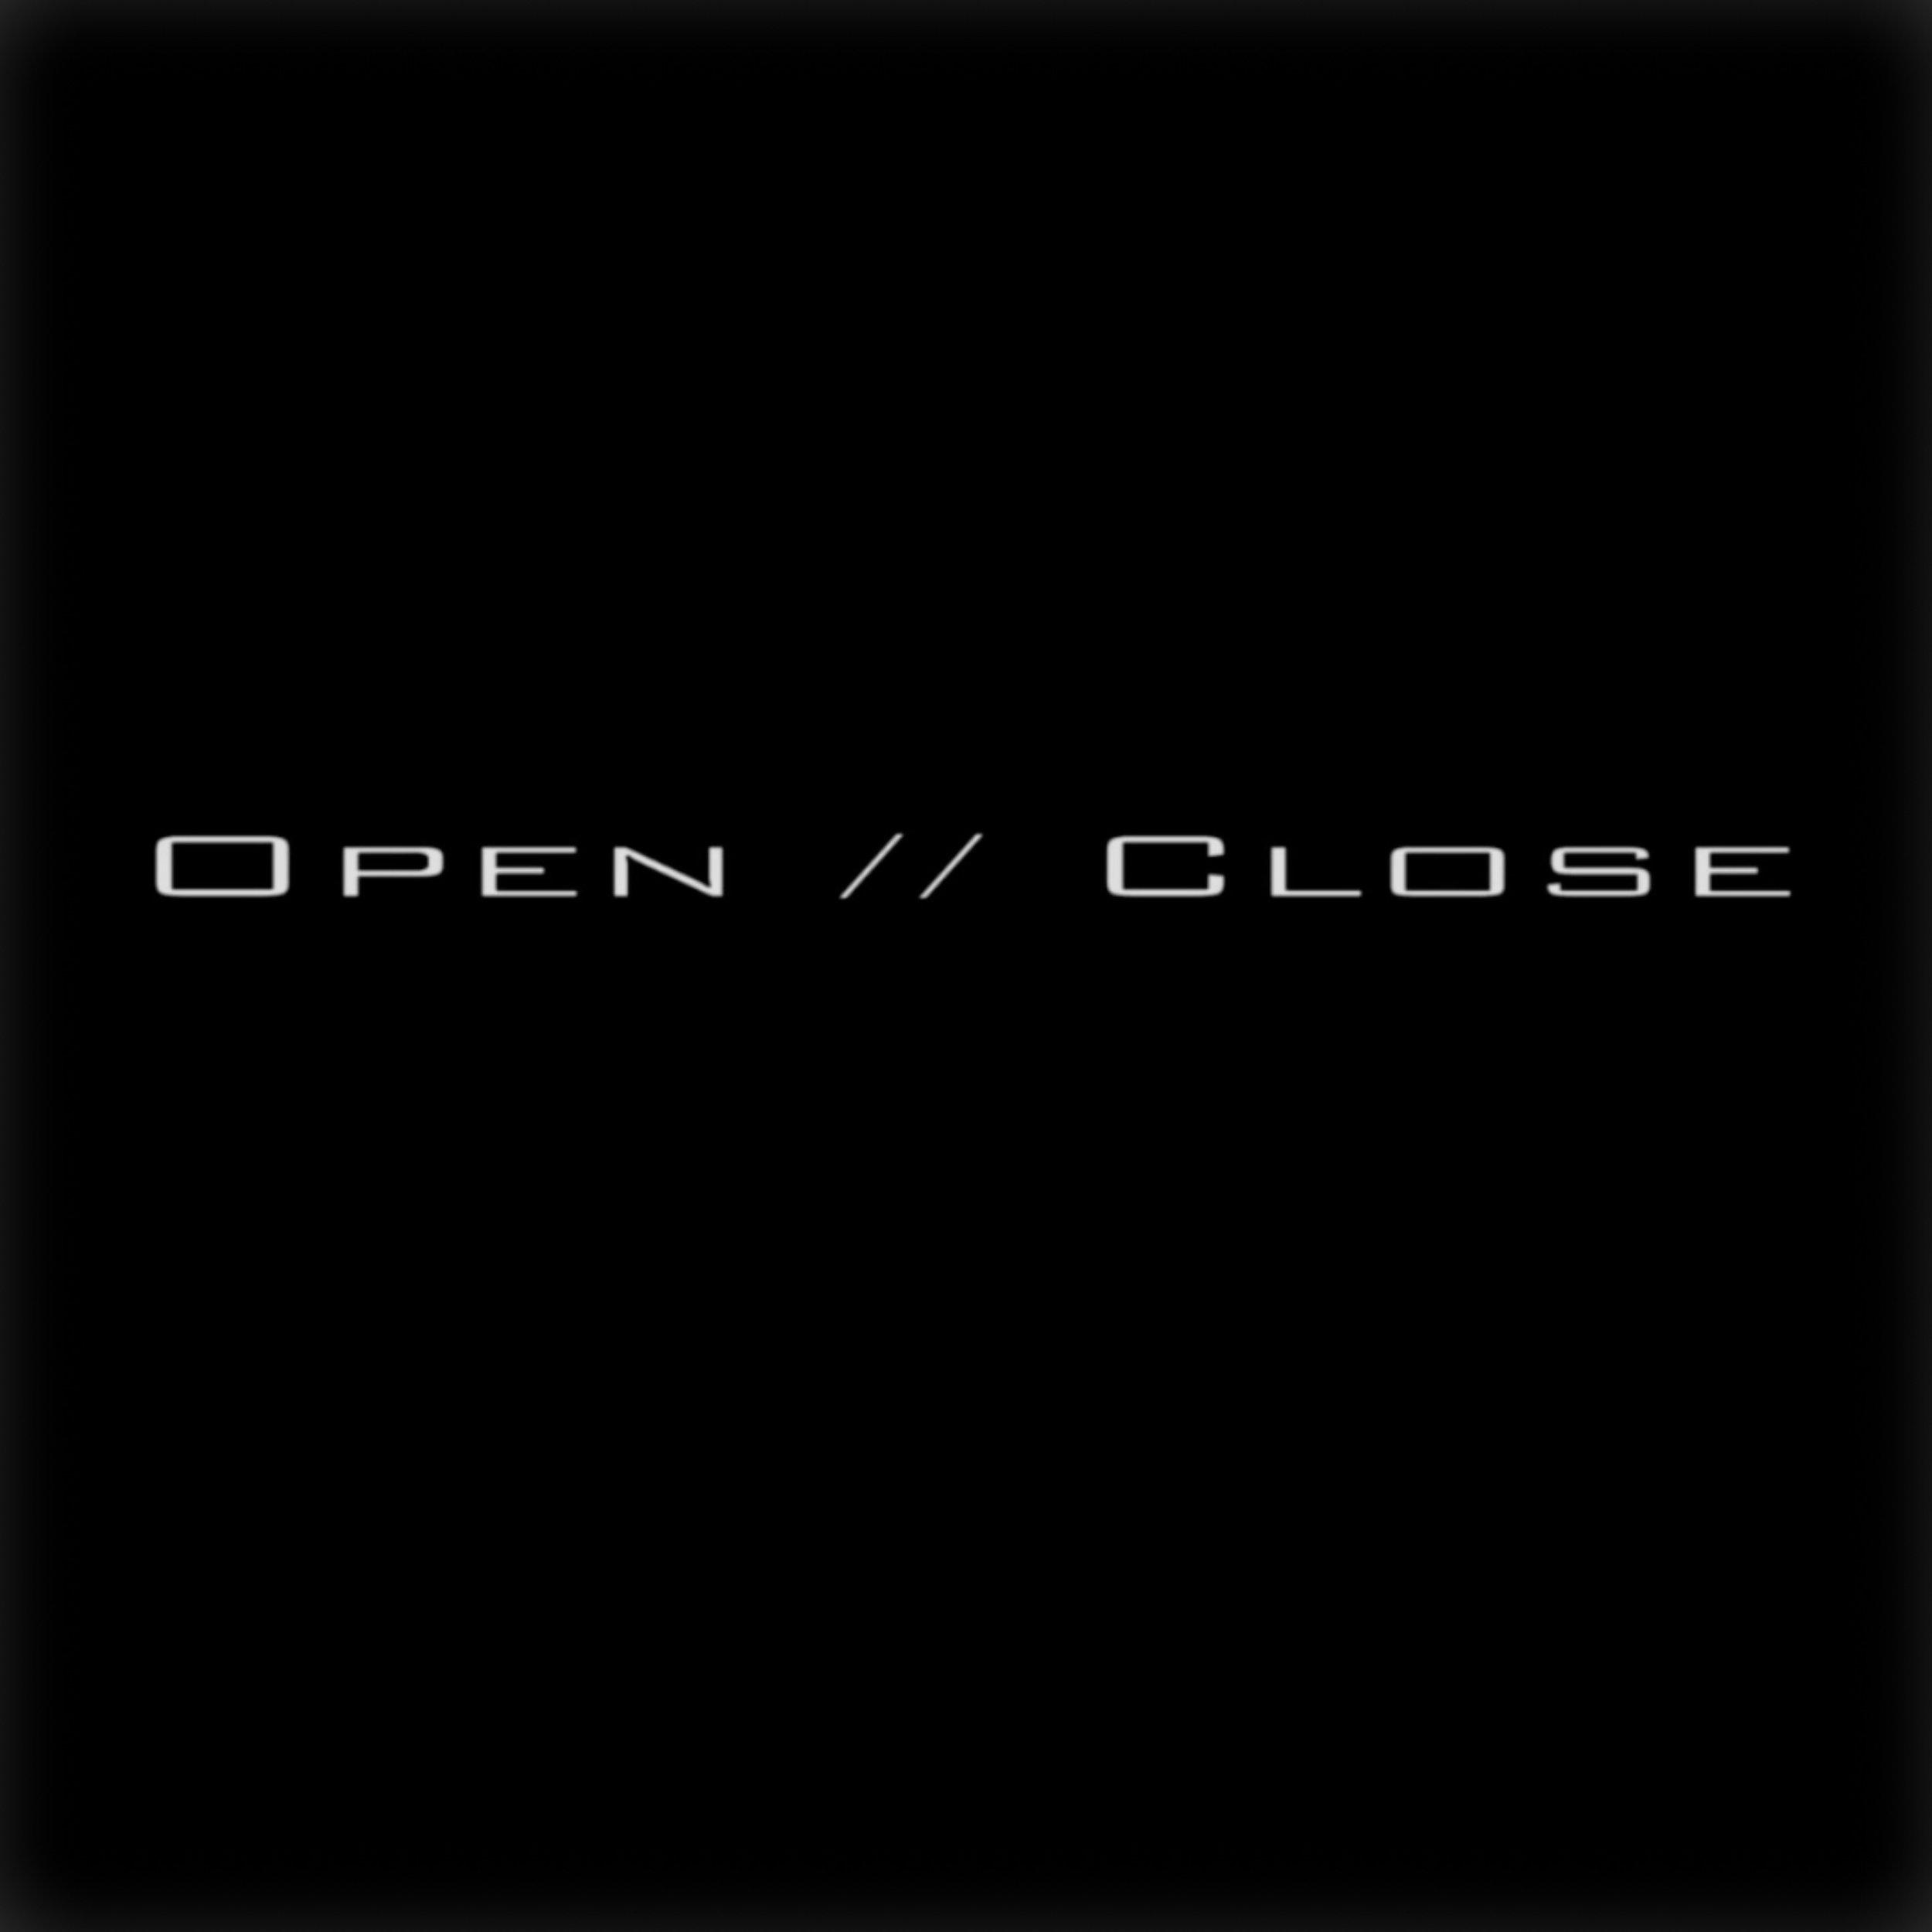 OPEN // CLOSE